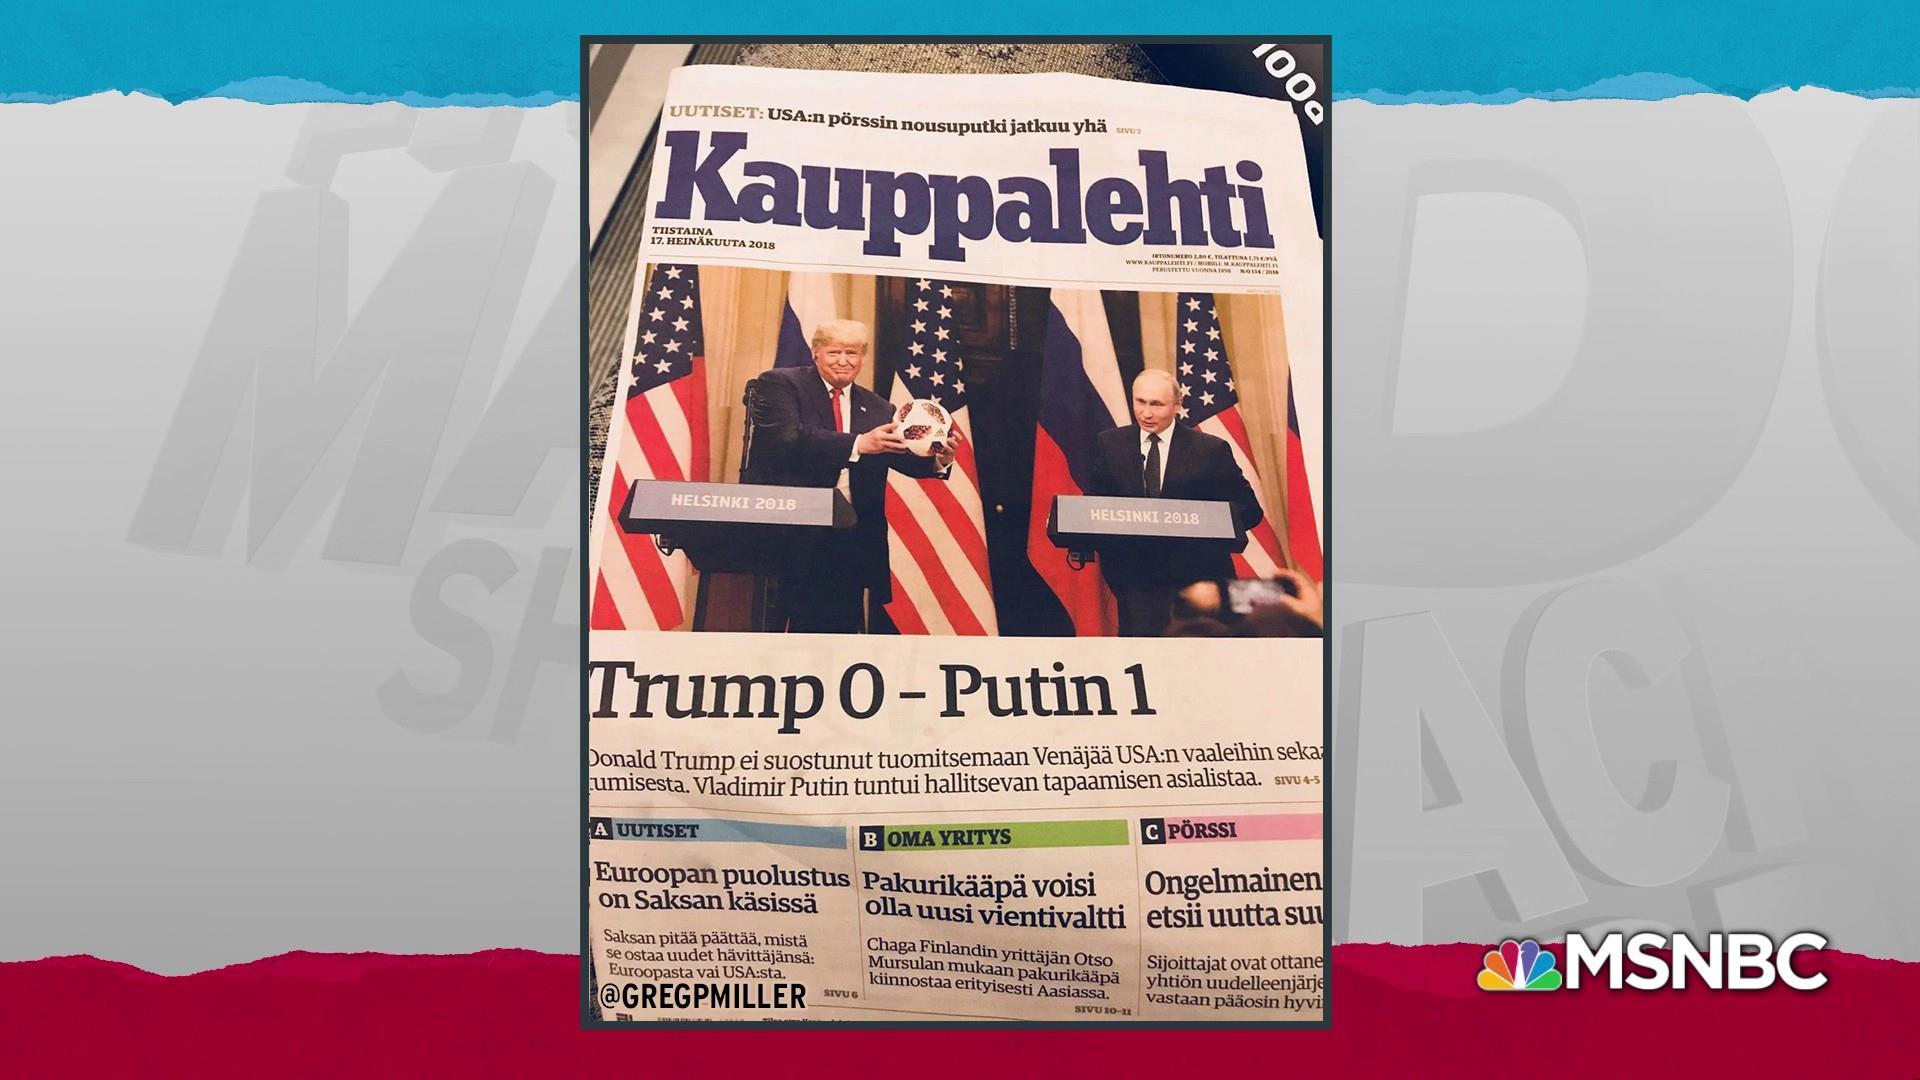 World struggles to understand Trump weakness before Putin